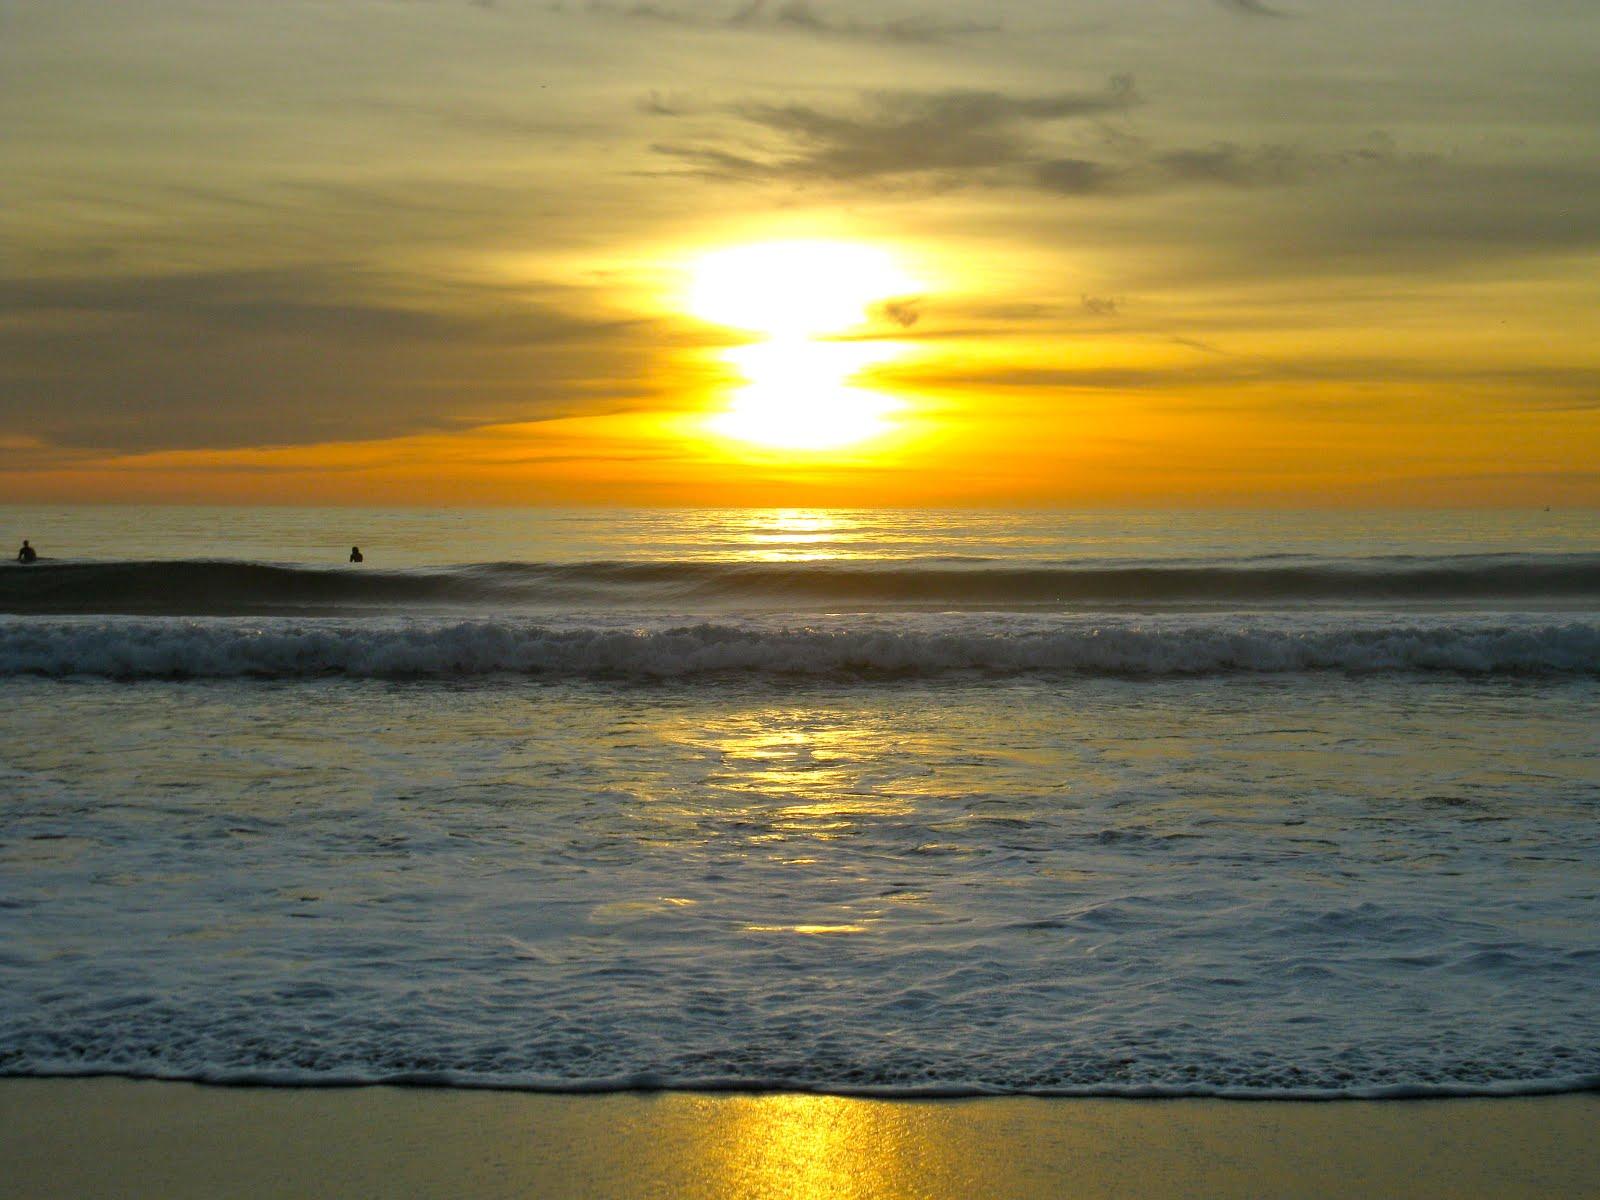 SUNSET OVER STA MONICA BAY